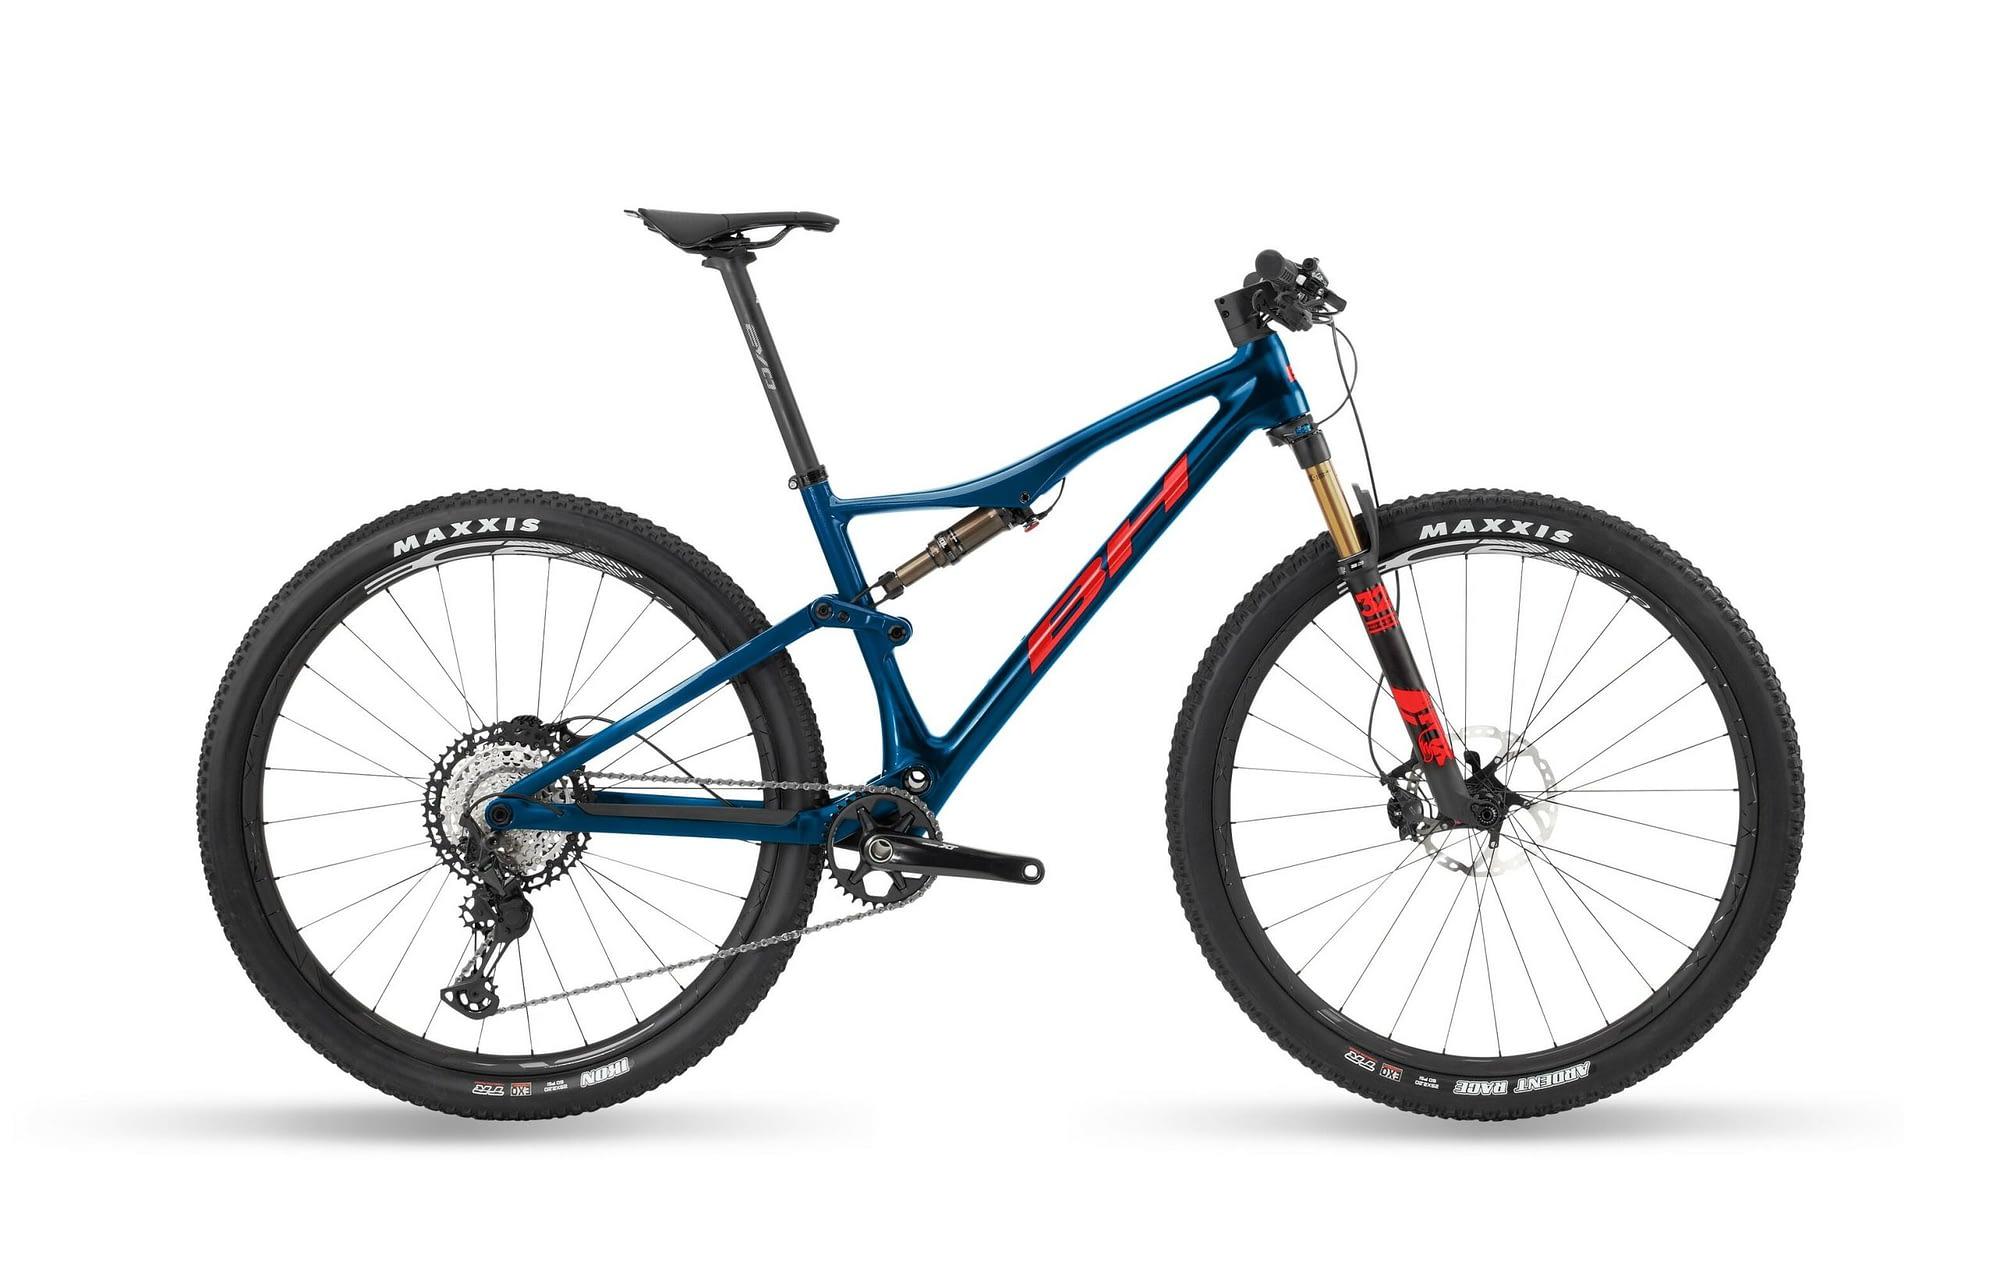 BH LYNX RACE EVO CARBON 9.2 - Rouge / Bleu, XL